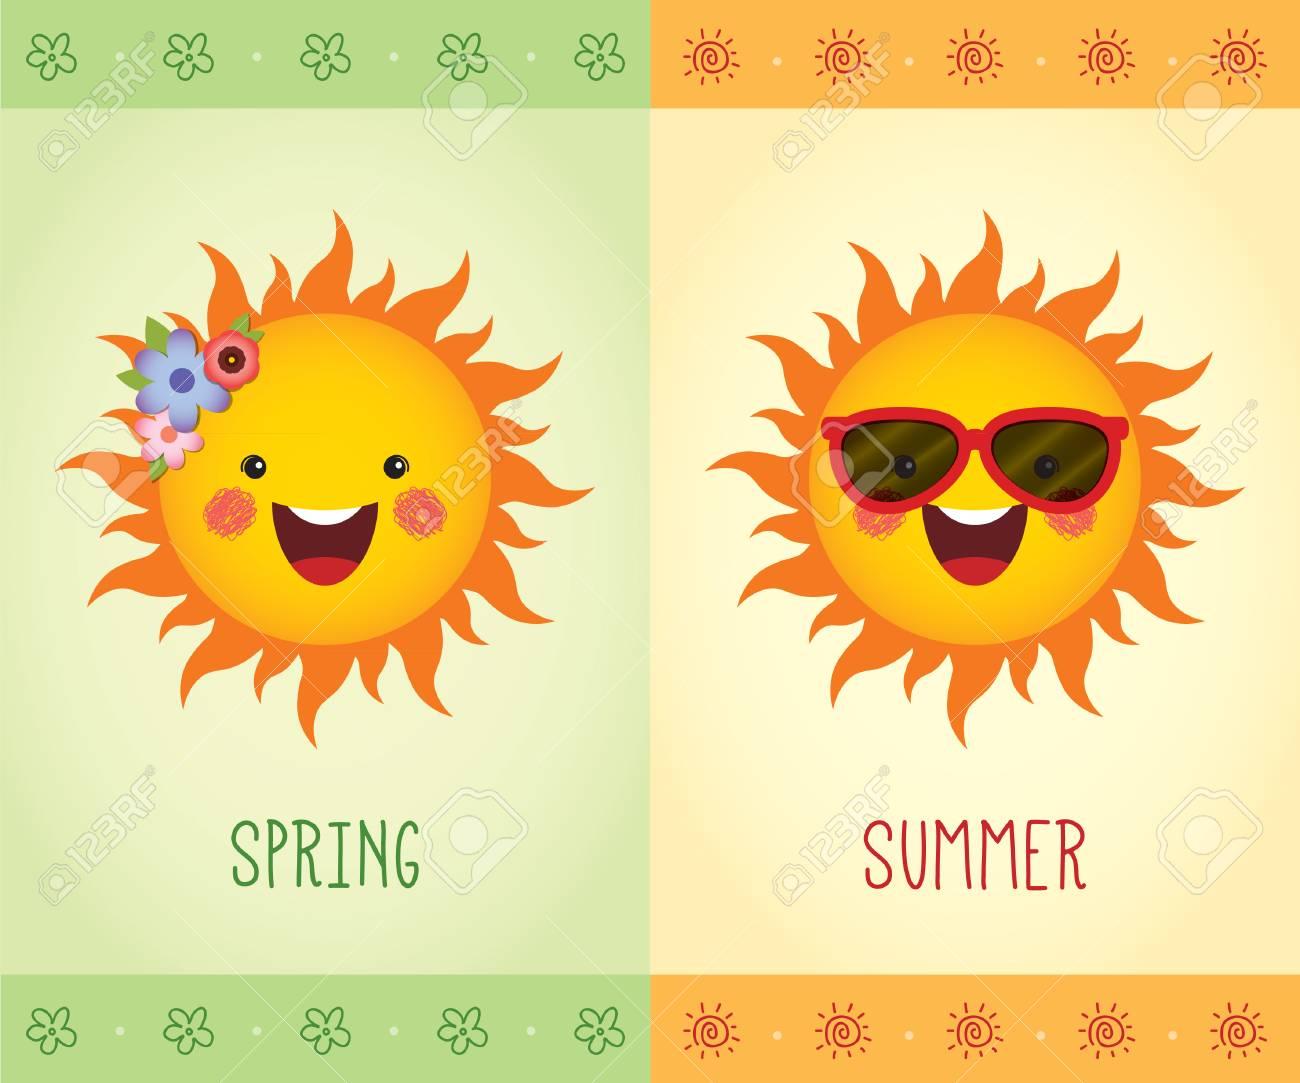 Cute Cartoon Sun Wearing Sunglasses Spring Flowers Spring And